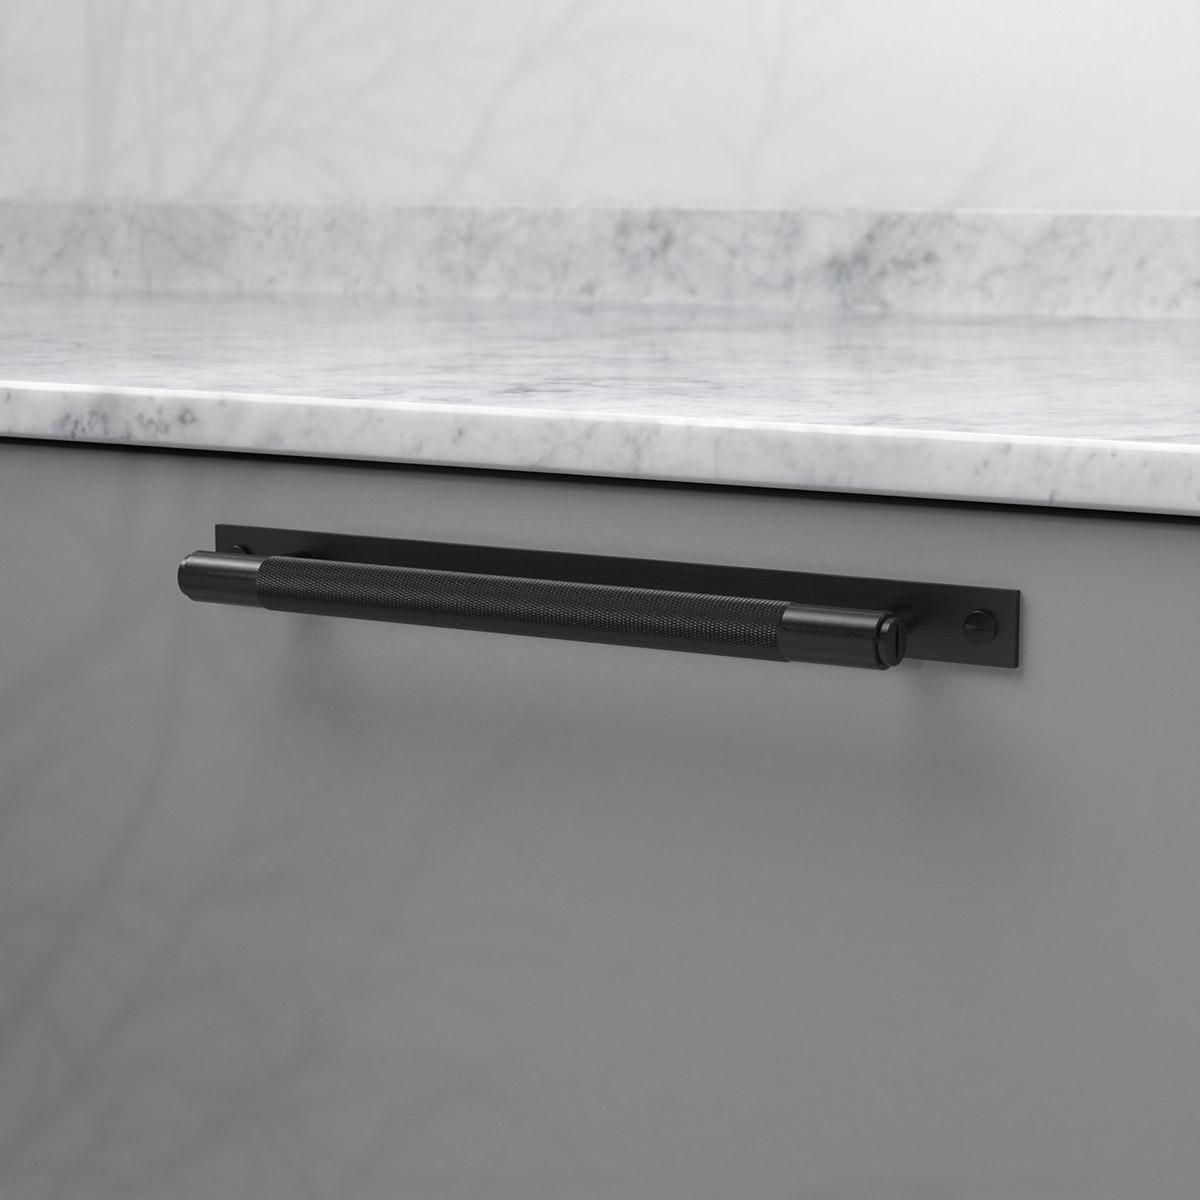 pull bar plate svart uk pb hp 260 bl a cc 225 mm ncs s 4500 n marmor carrara